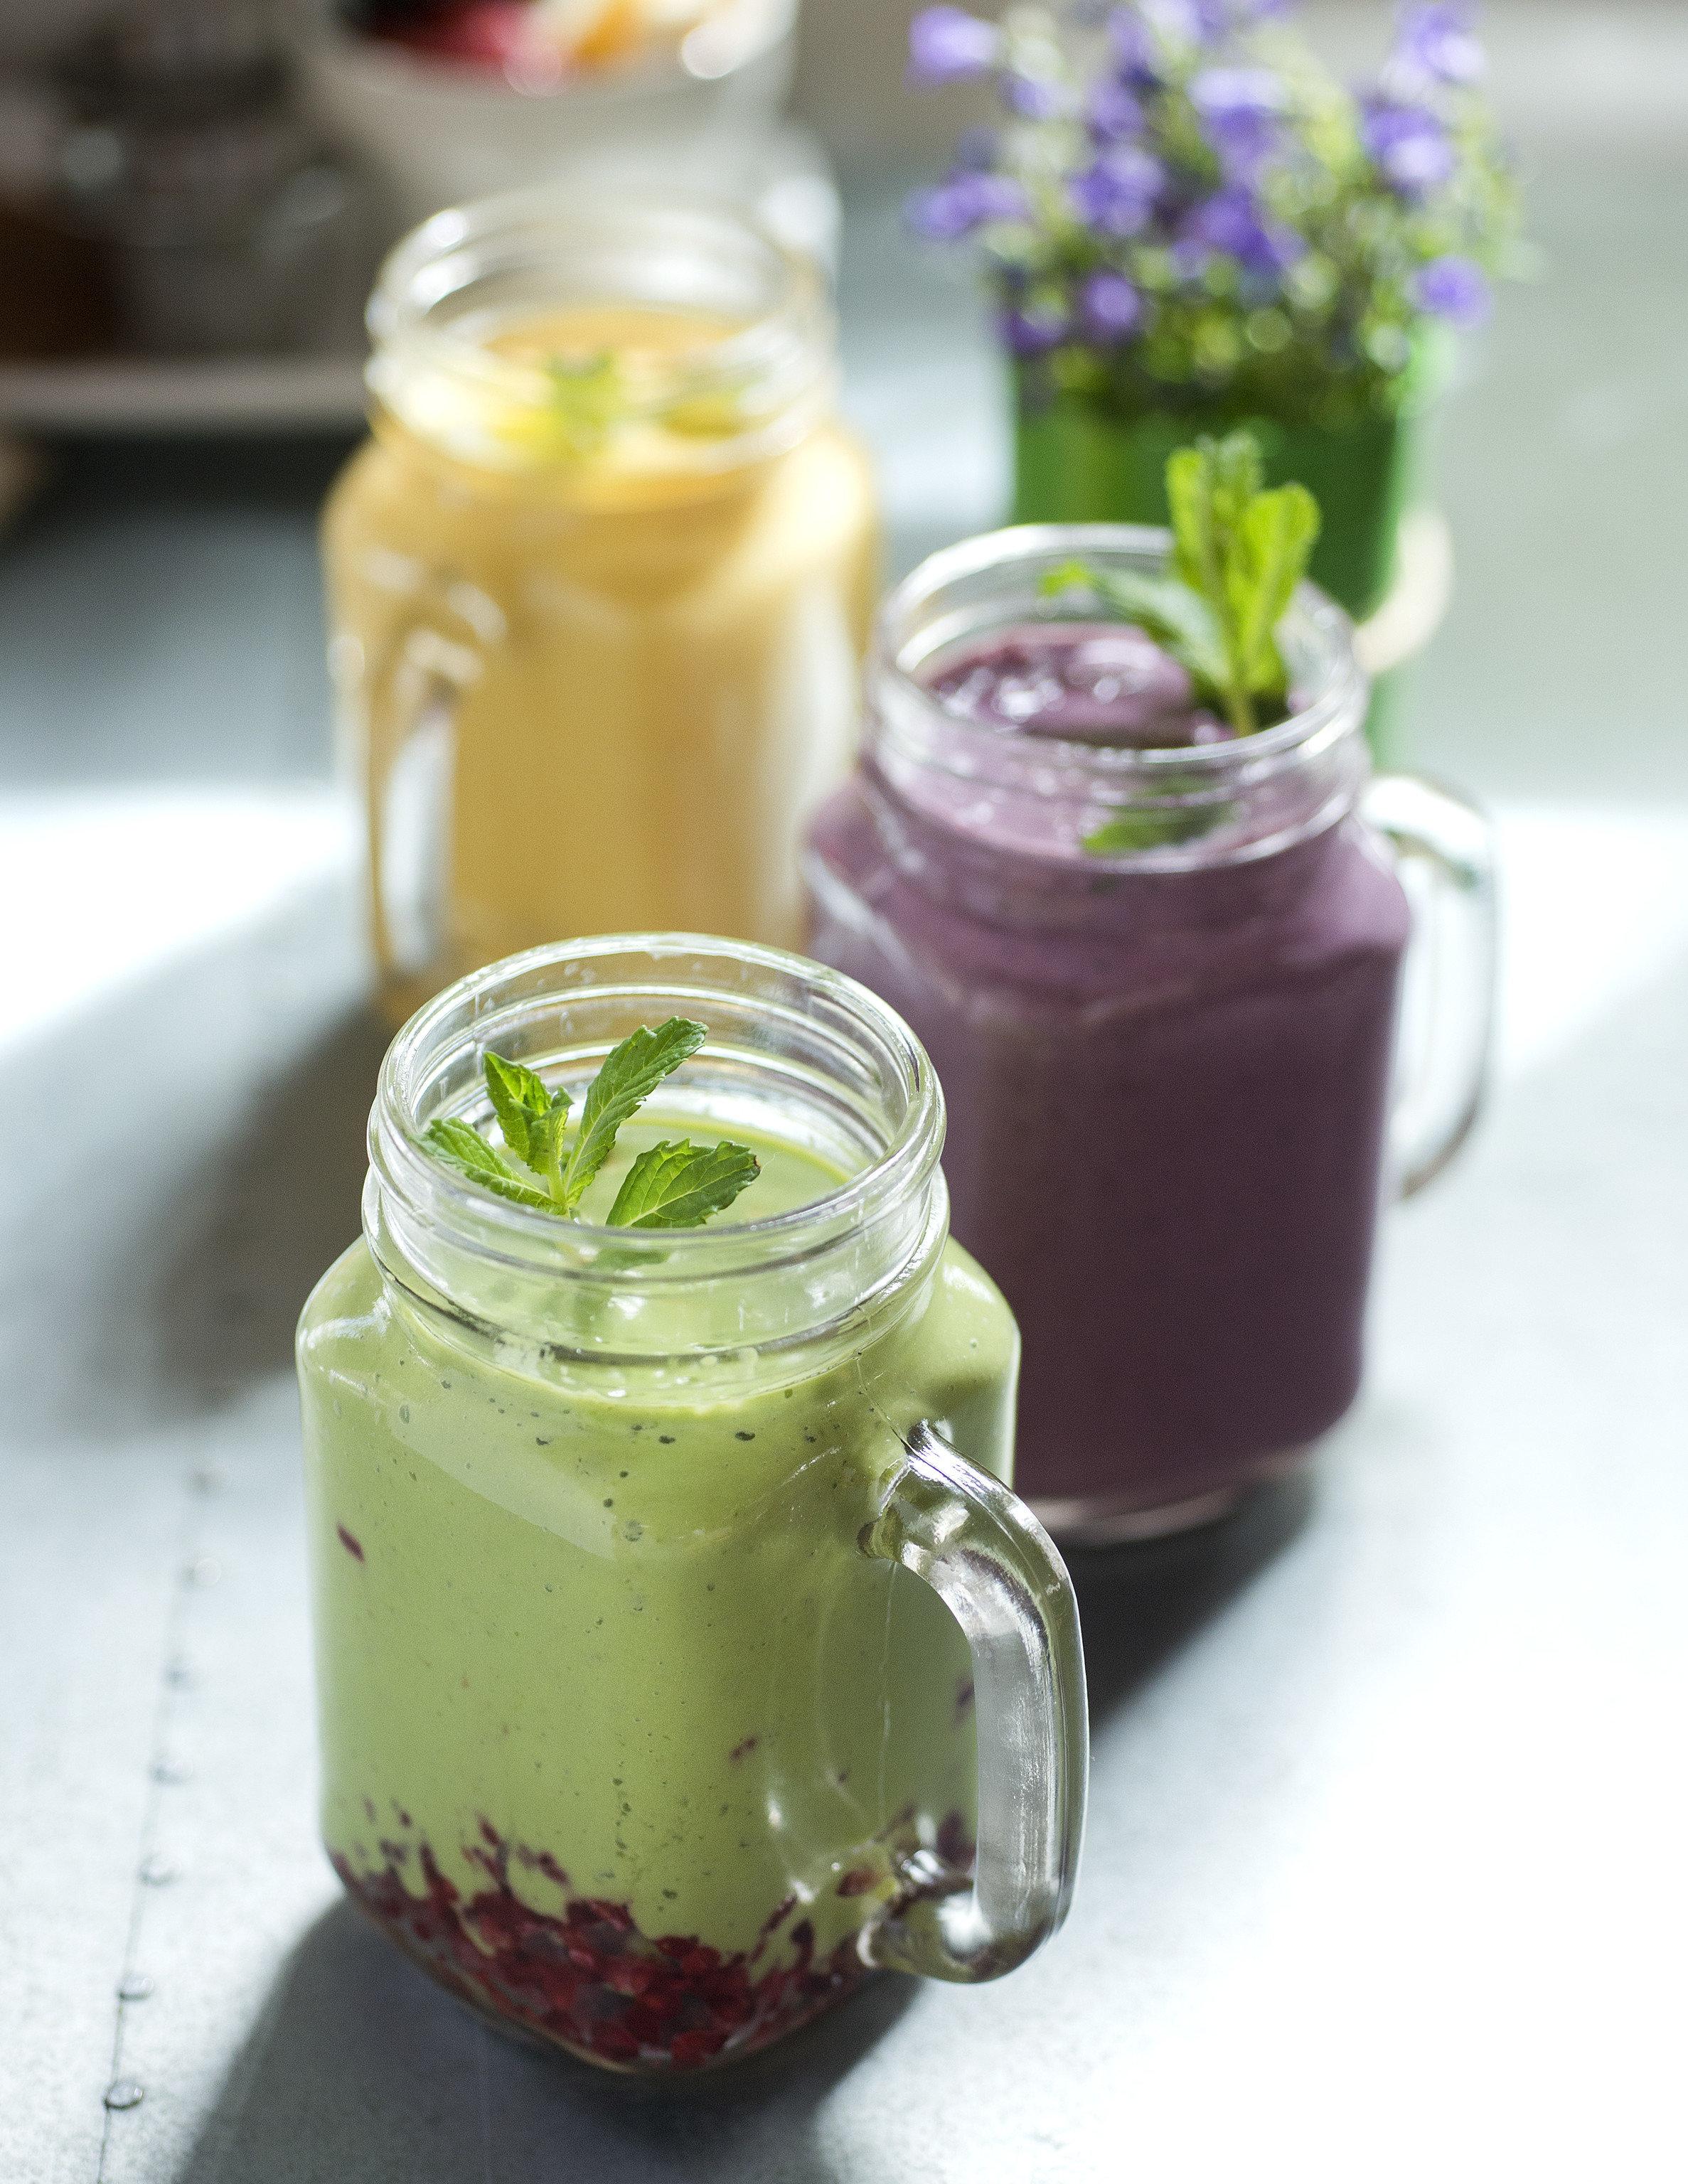 Trip Ideas cup food plant produce Drink land plant smoothie juice fruit vegetable flowering plant